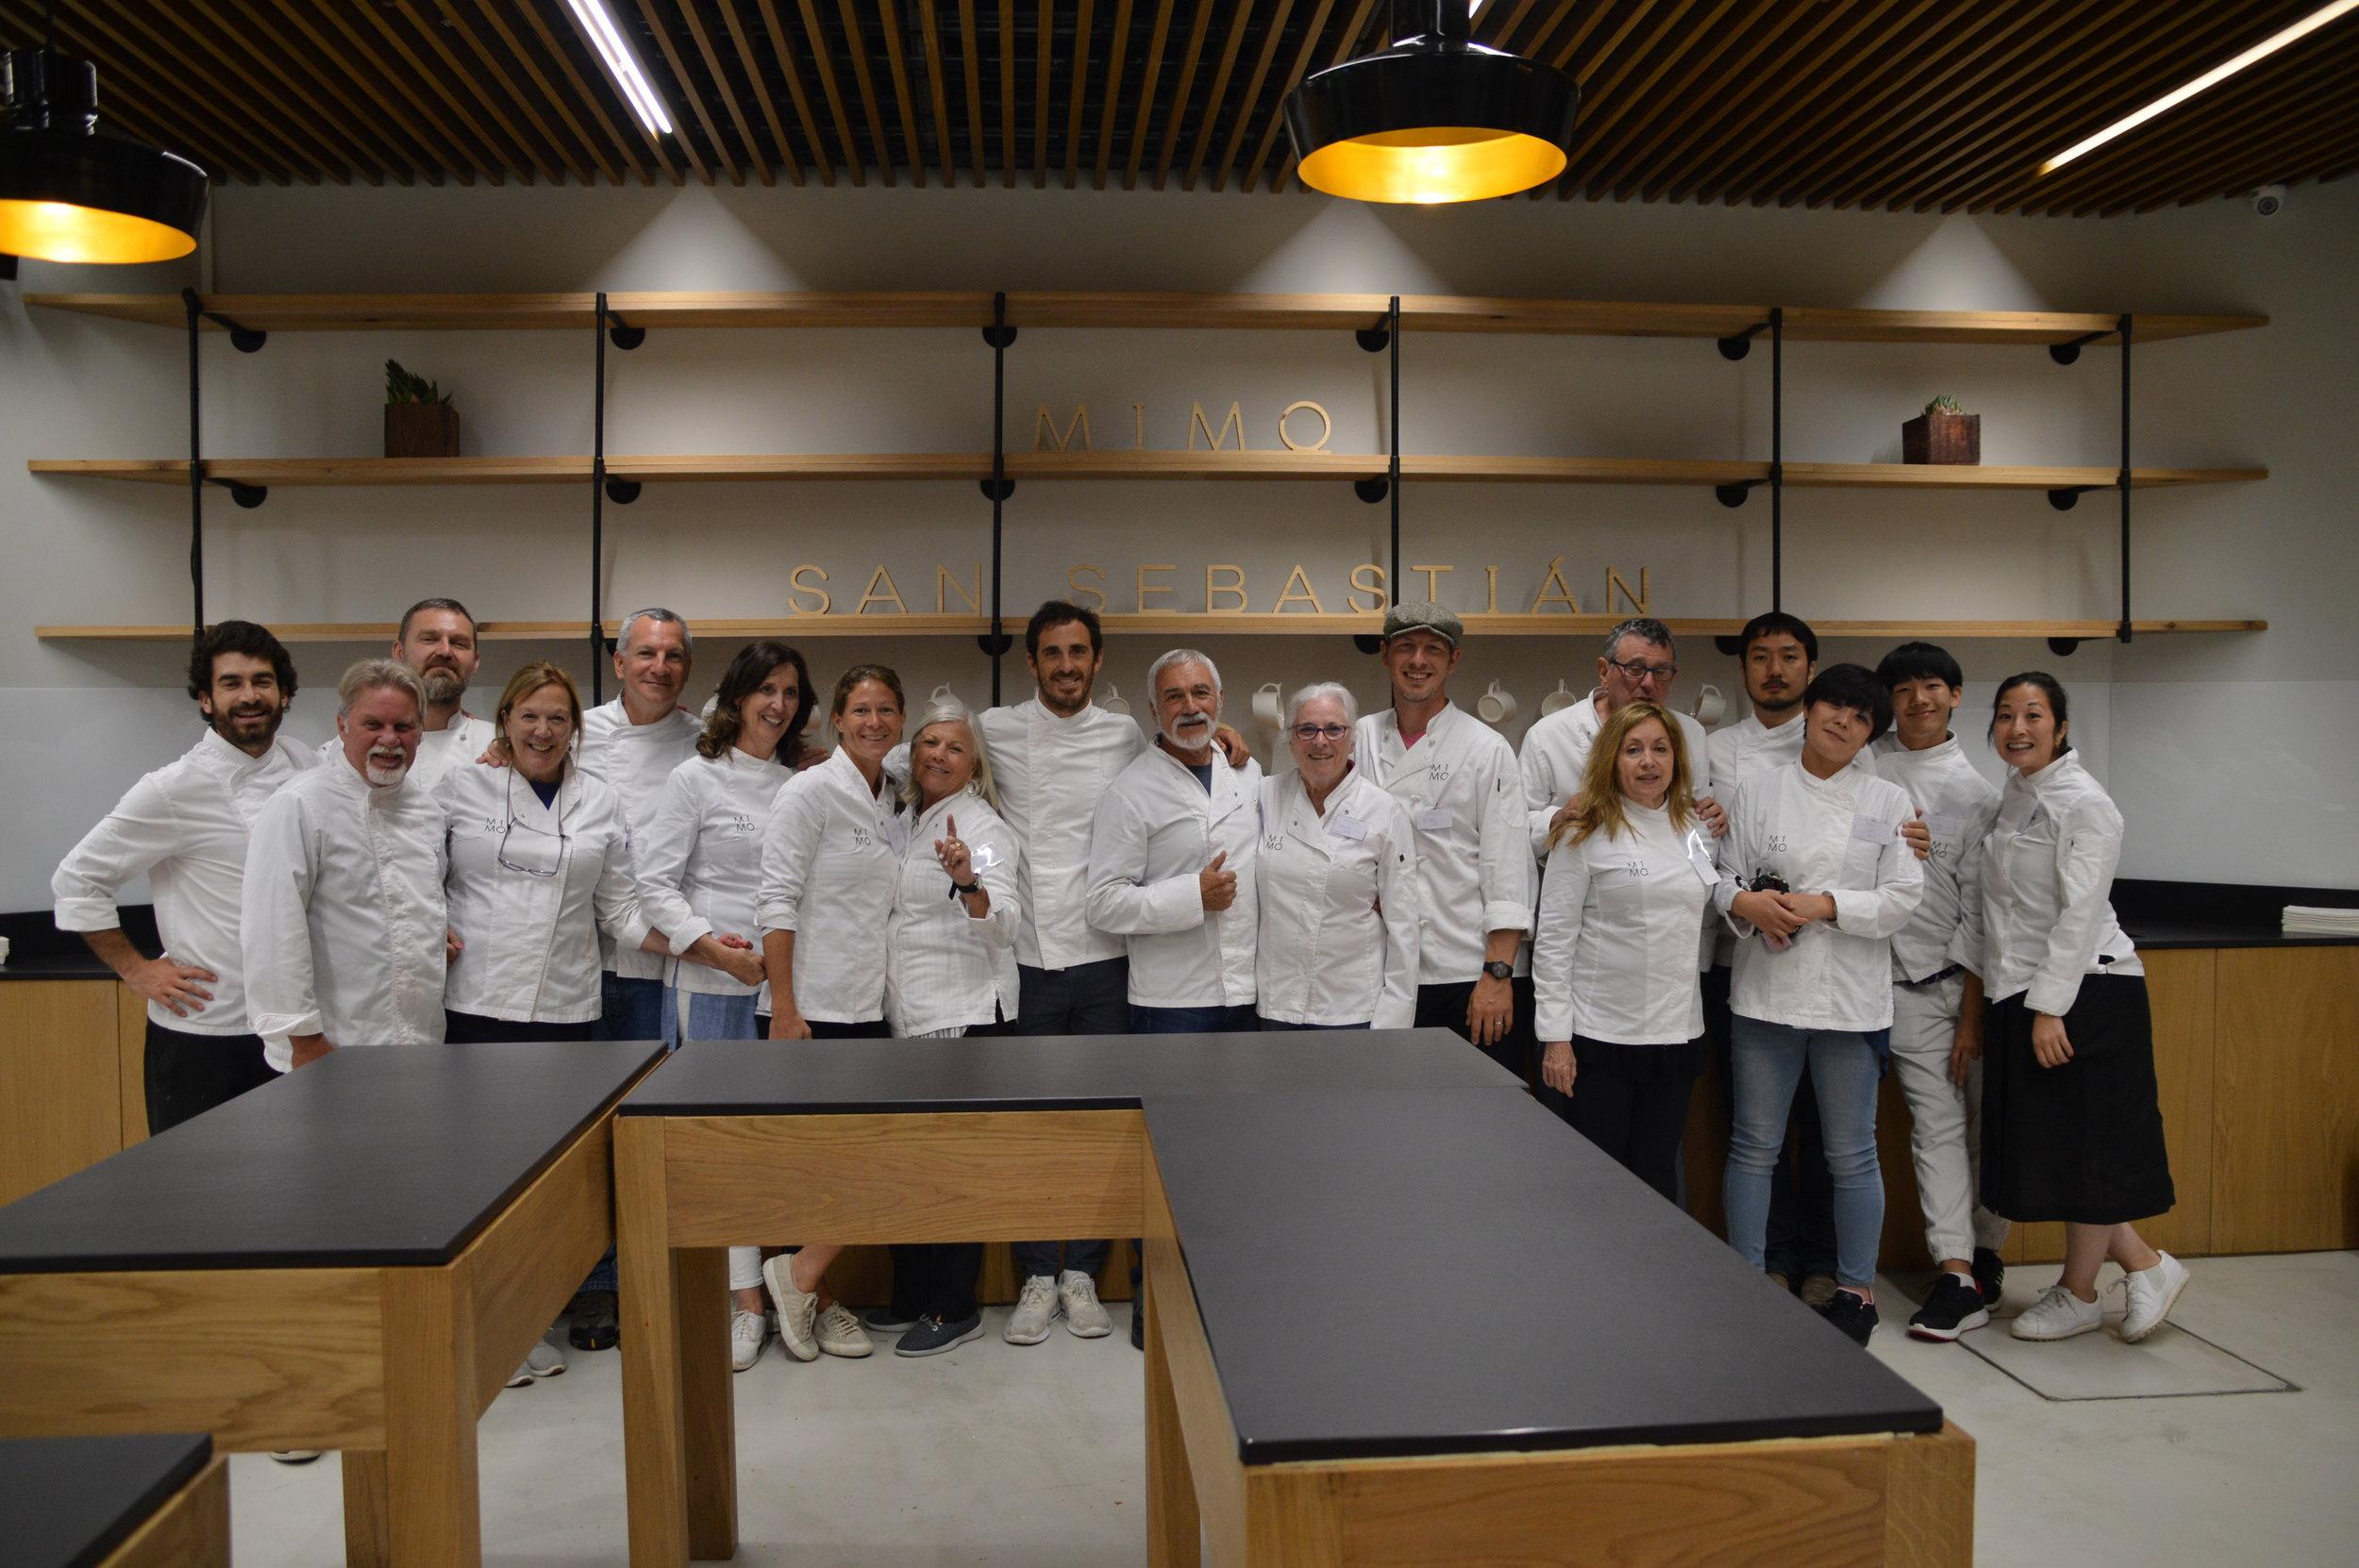 Core Retreat 2019 - San Sebastian, Spain Cooking Class at Mimo